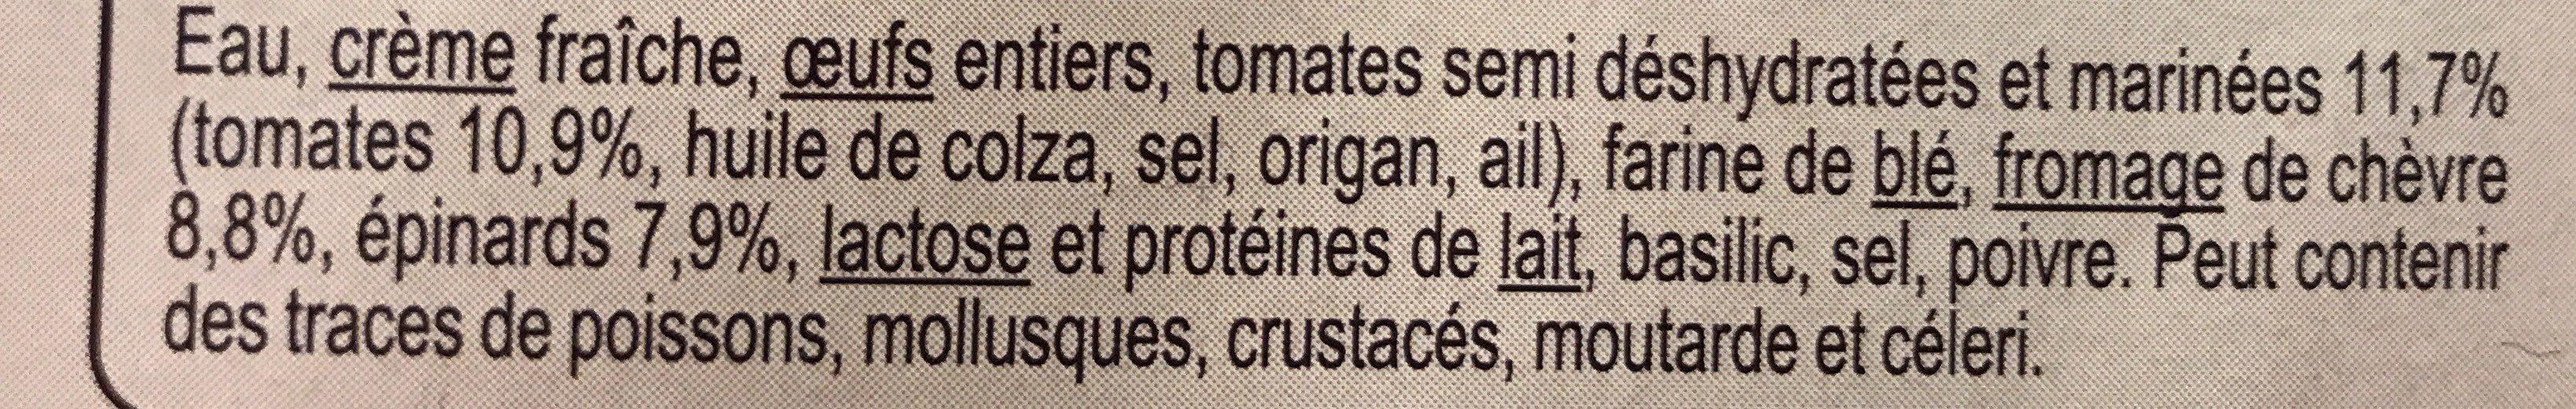 Clafoutis tomate chevre epinards - Ingrédients - fr